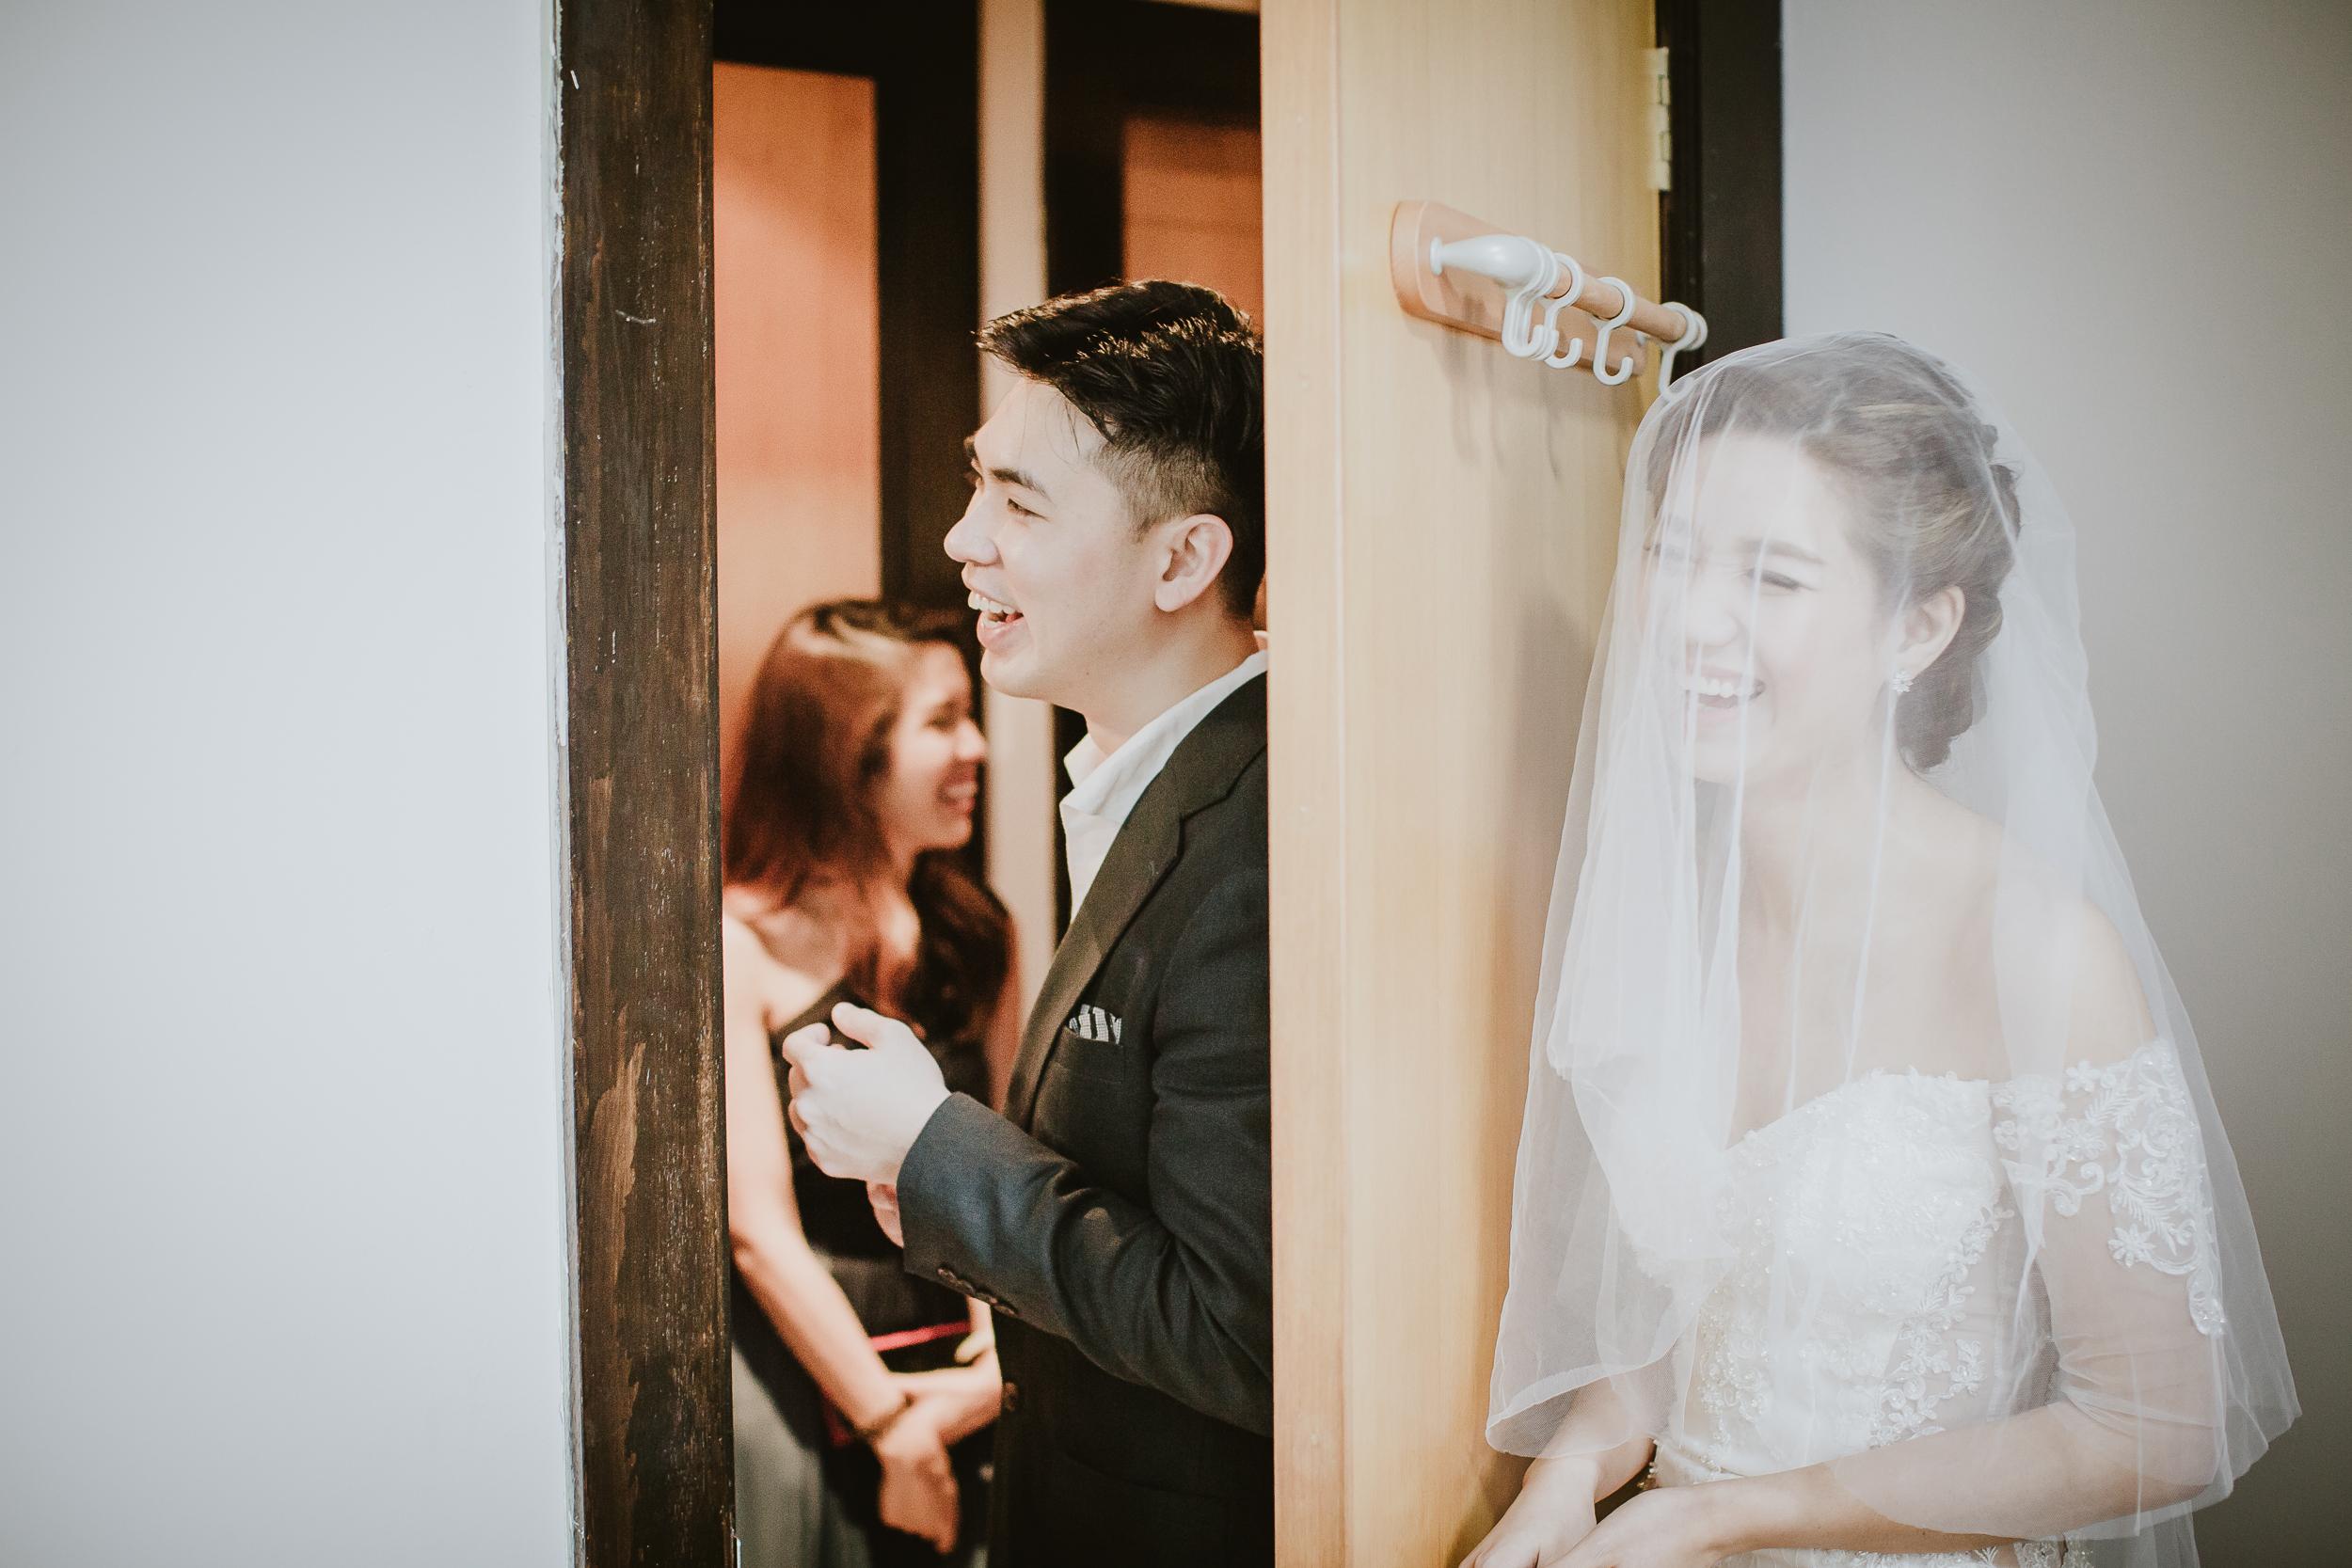 Singapore+Actual+Day+Wedding+Photographer+Raffles+Town+Club+Jeremiah+Christina-0032.jpg